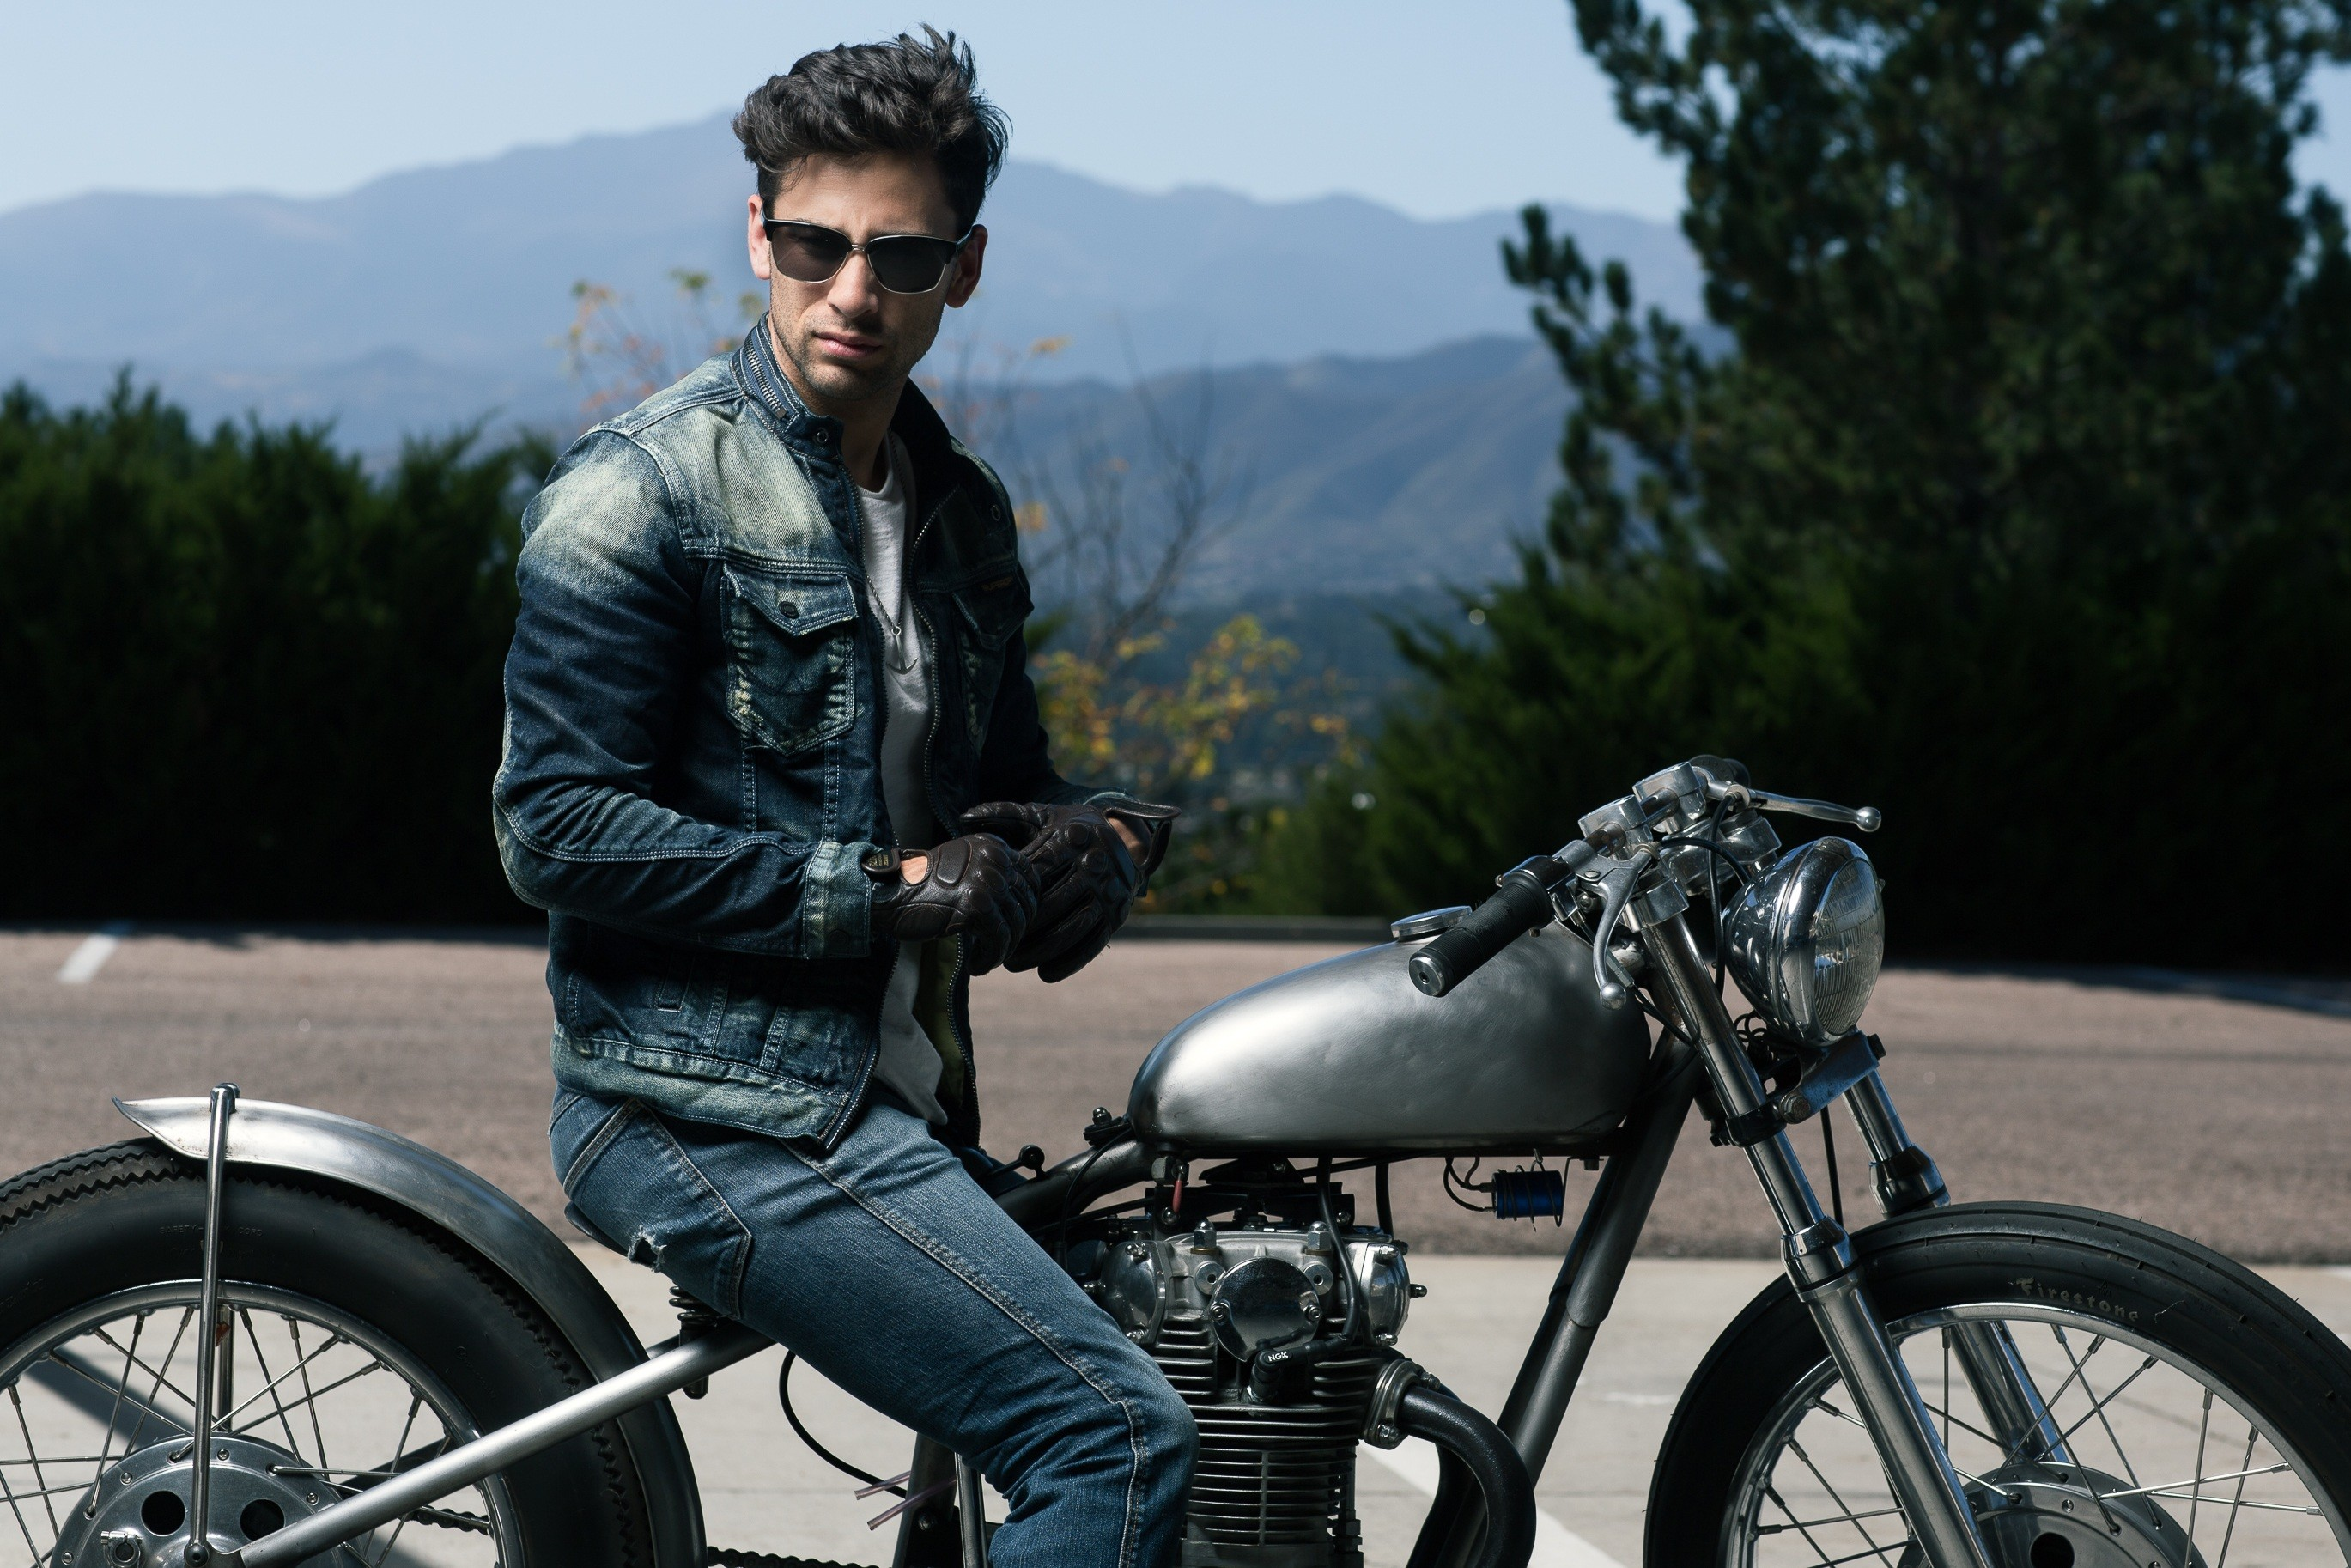 Res: 2738x1826, Model sitting on an old vintage motorbike